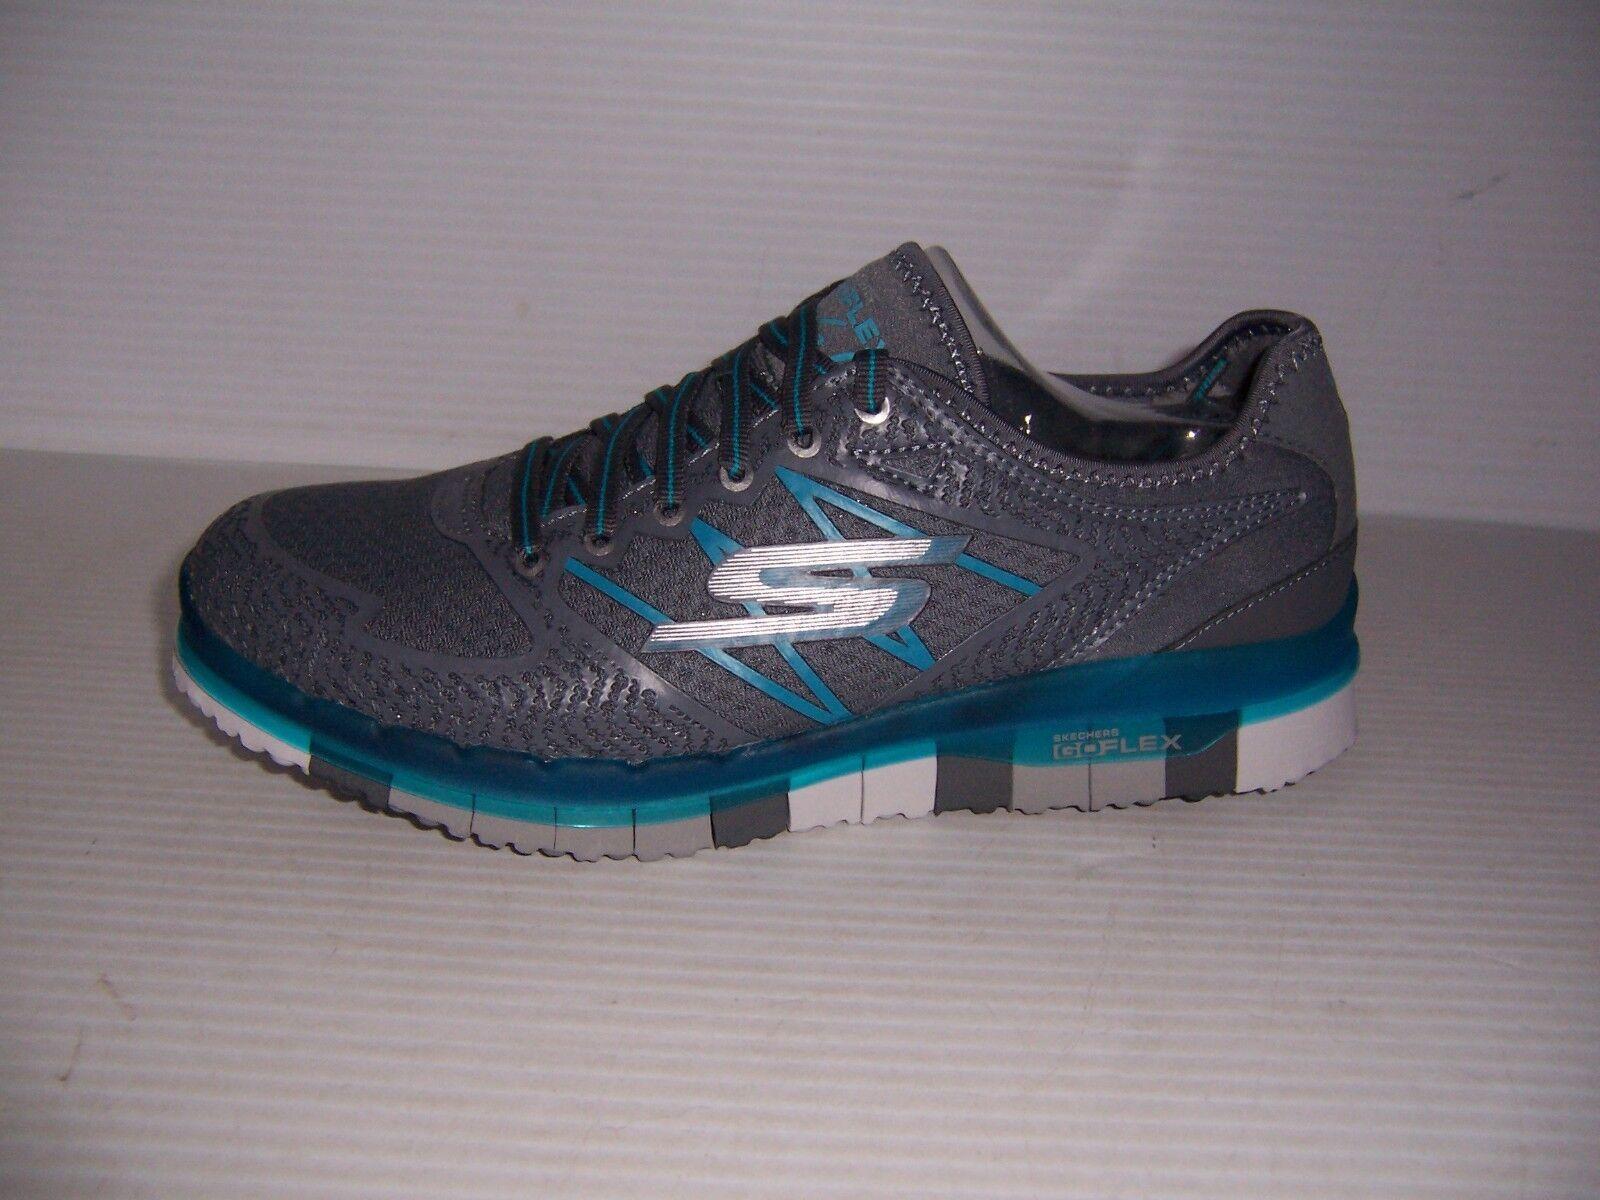 skechers go flex walk shoes